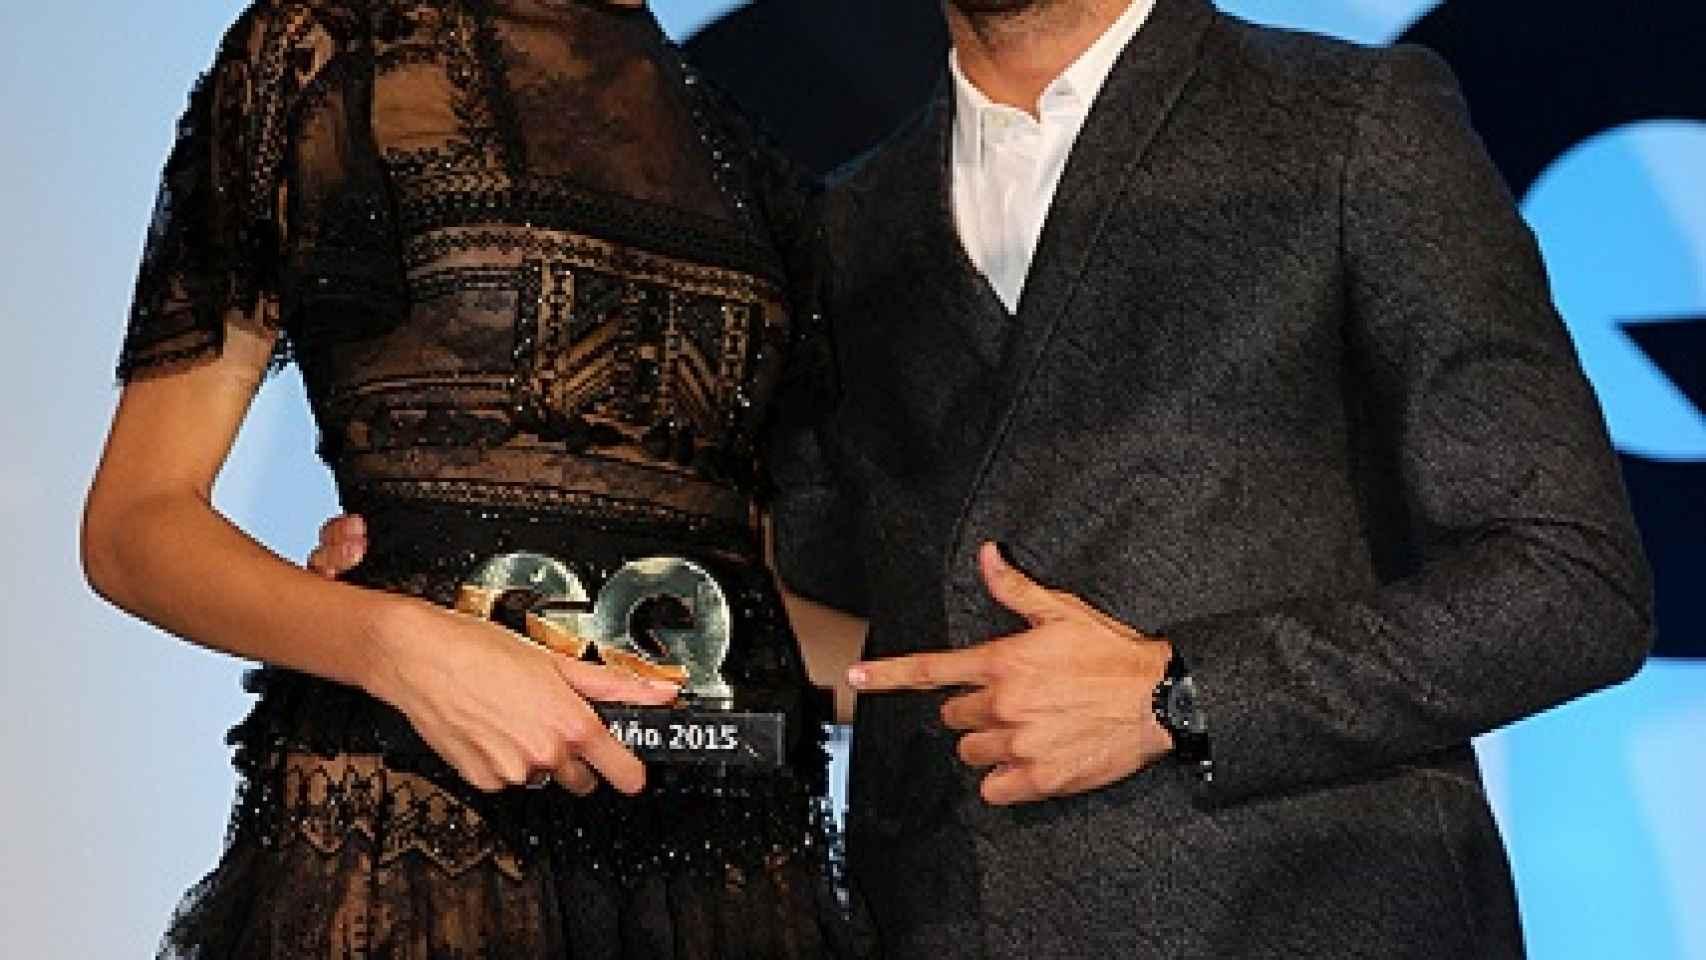 Maxi Iglesias le entregó el premio a la modelo Dalianah Arekion